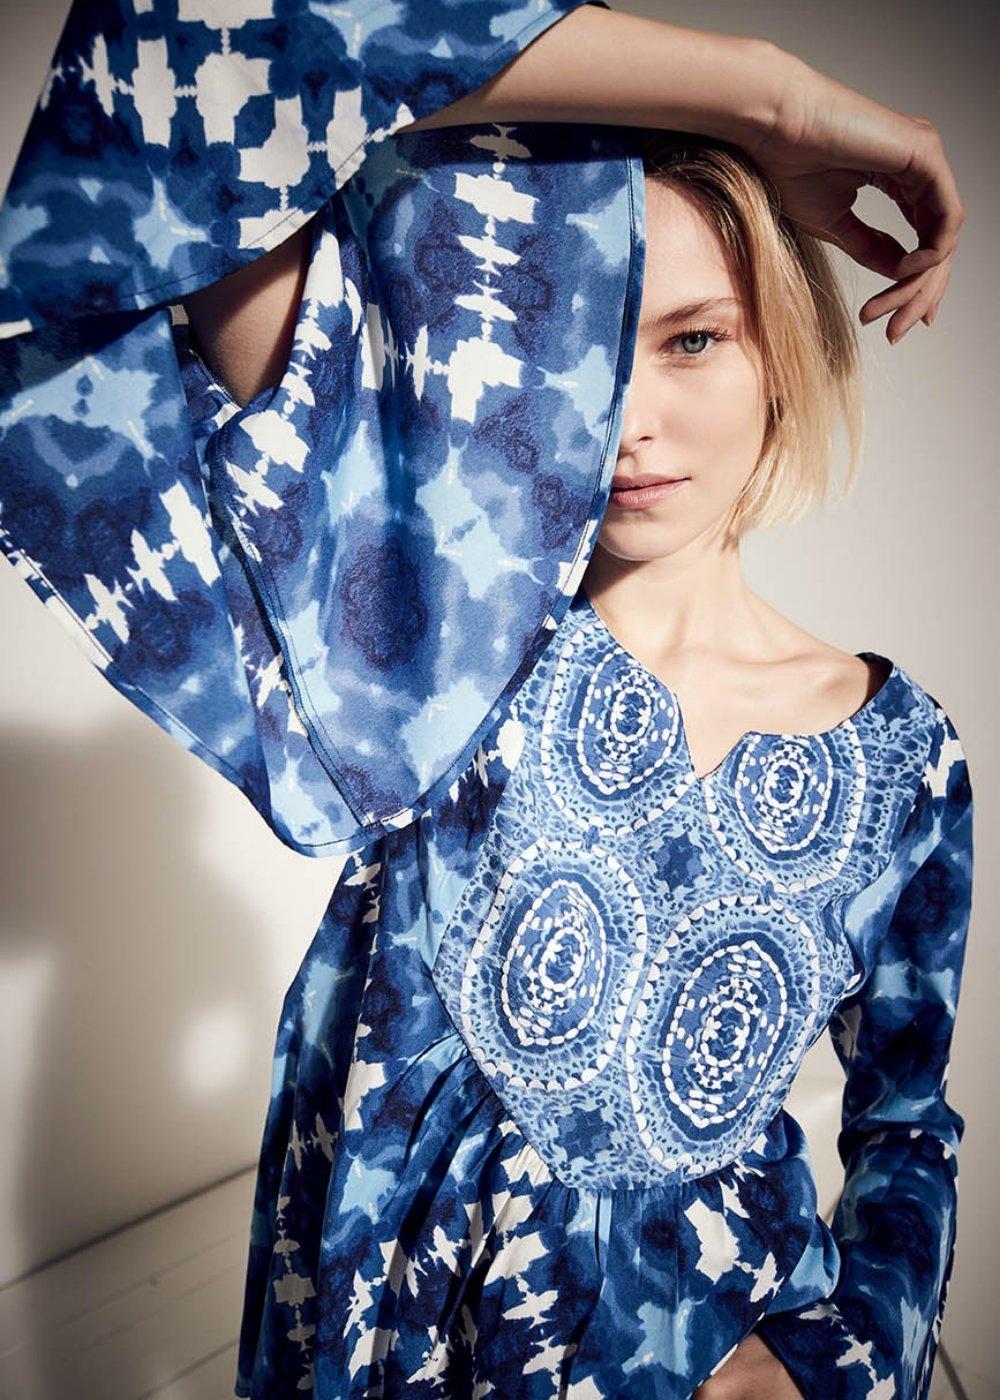 Cleo tie-dye blouse - Oltremare\Abisso\ Fantasia - Woman